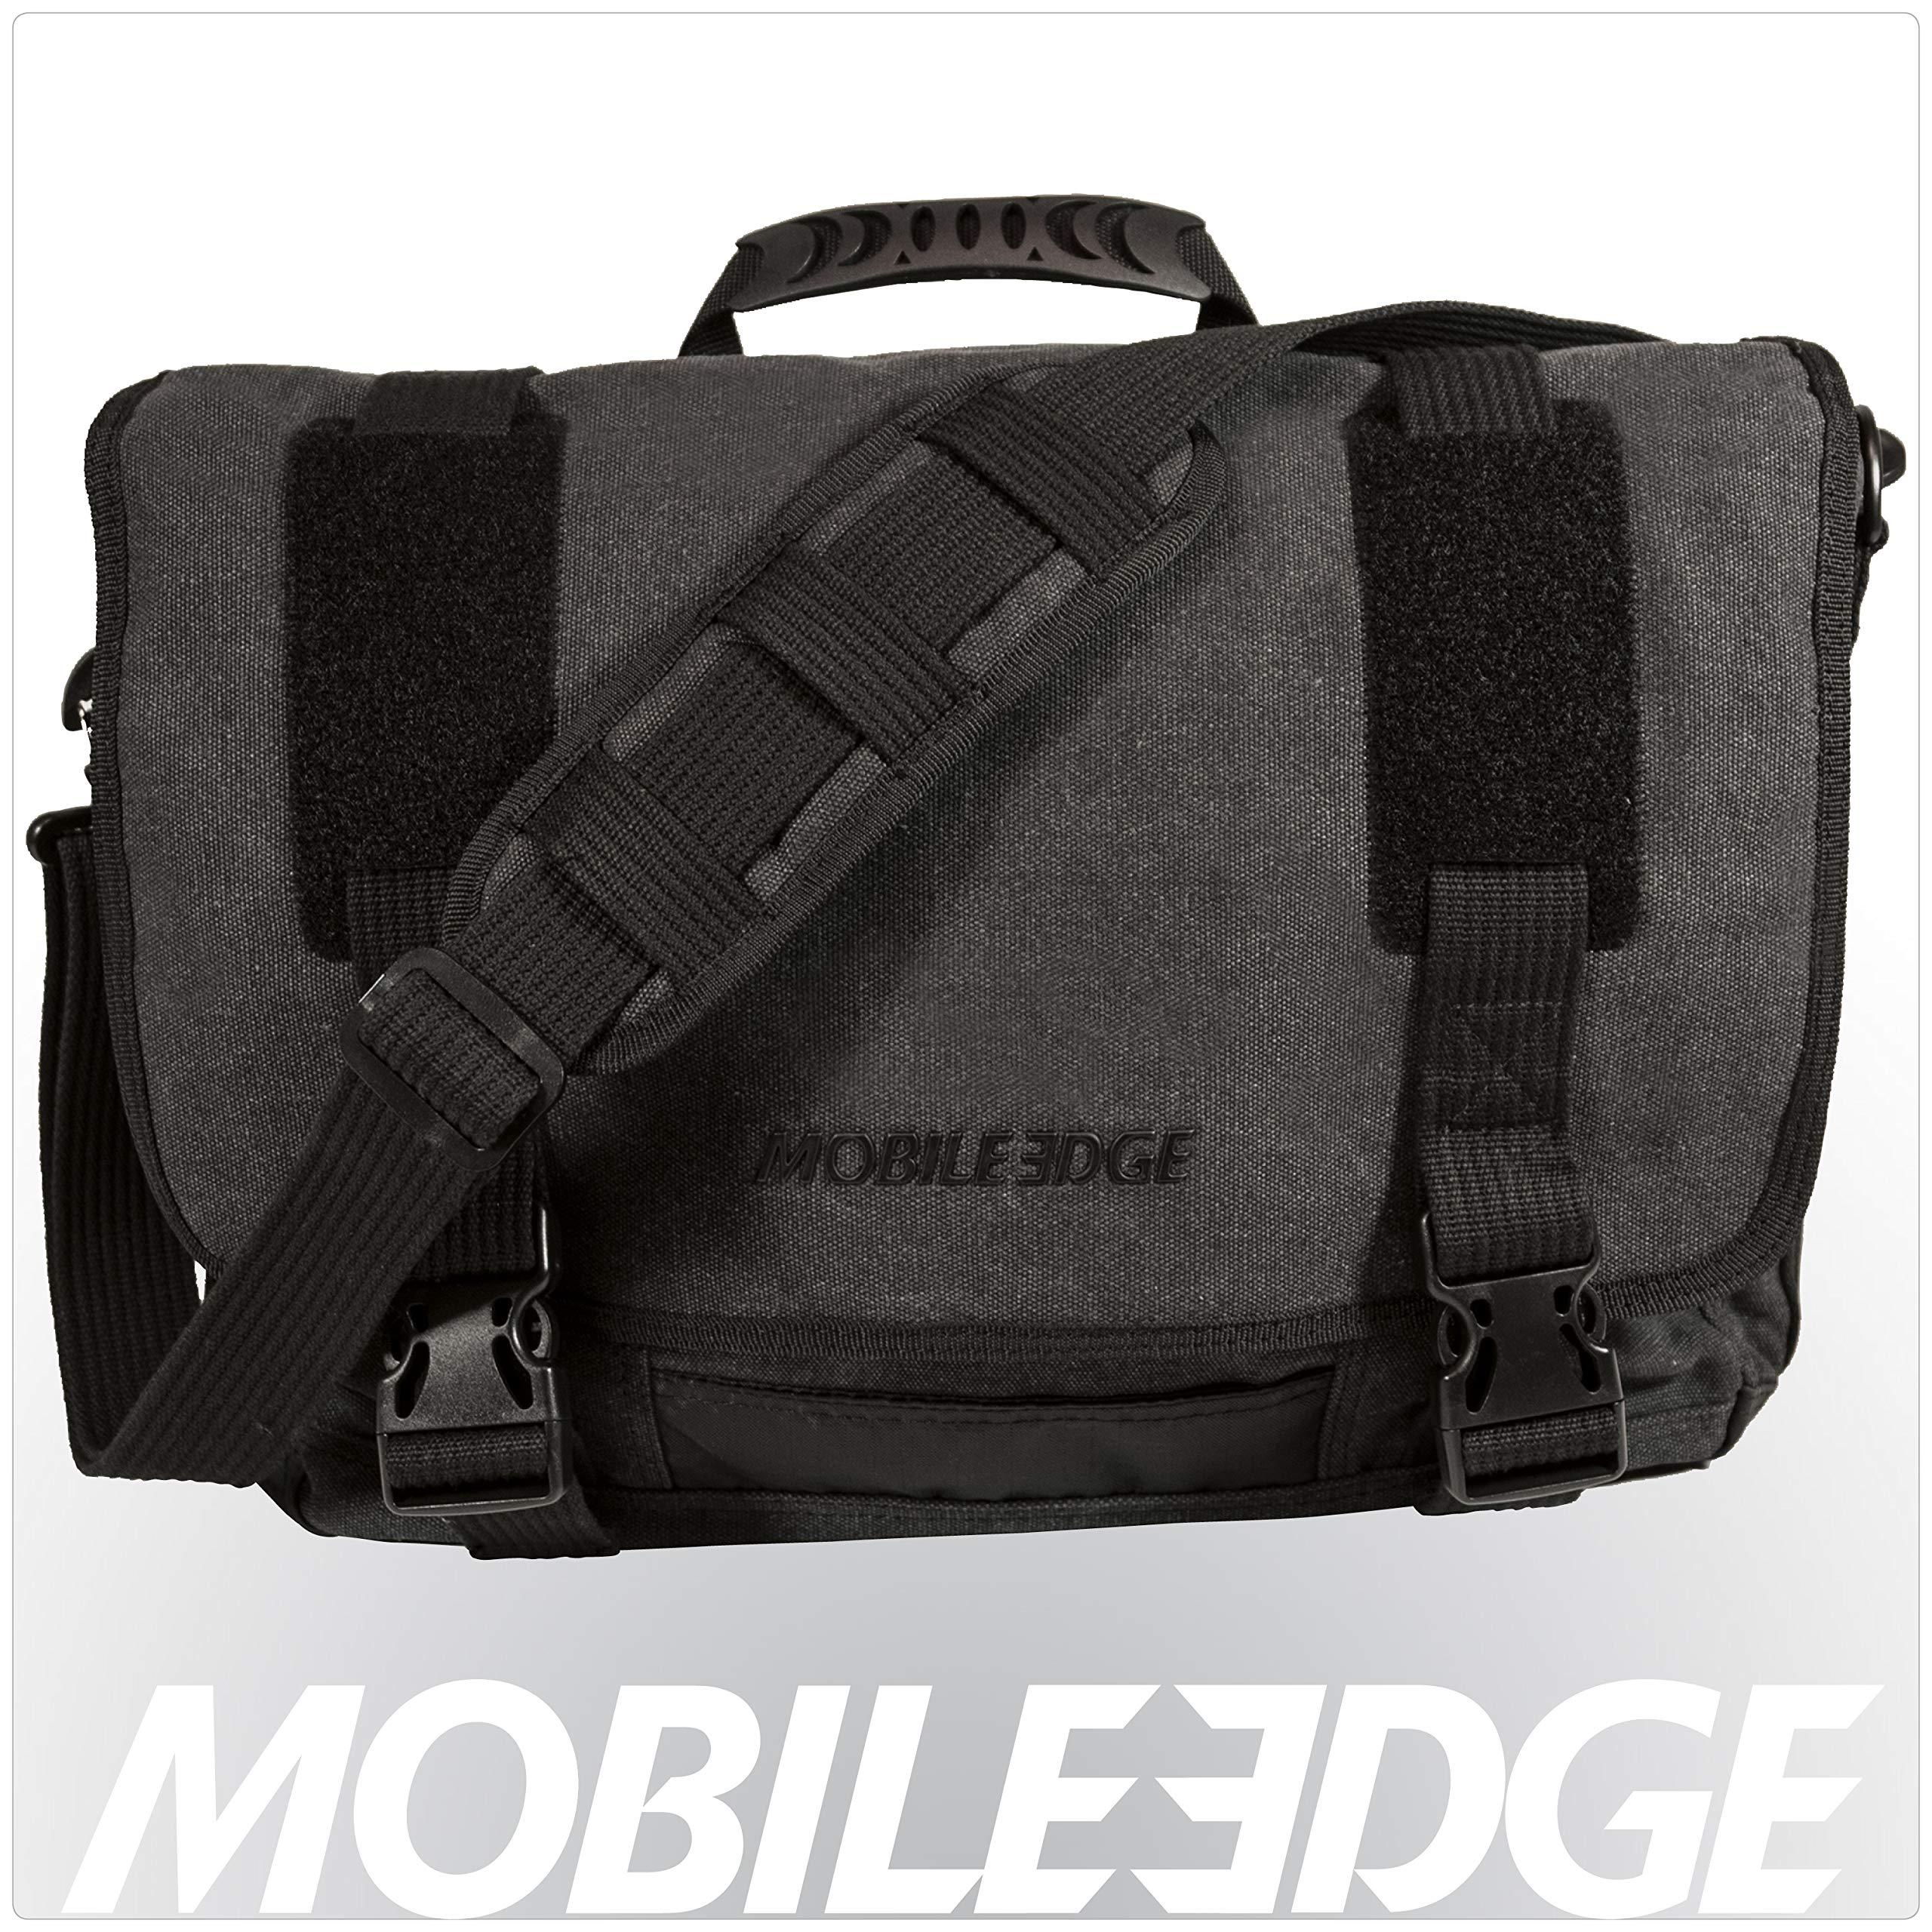 Mobile Edge Laptop/Tablet 14.1'' Ultrabook or 15'' MacBook Eco-Friendly Messenger Bag, Cotton Canvas, Charcoal for Men, Women, Business, Student MEUME5